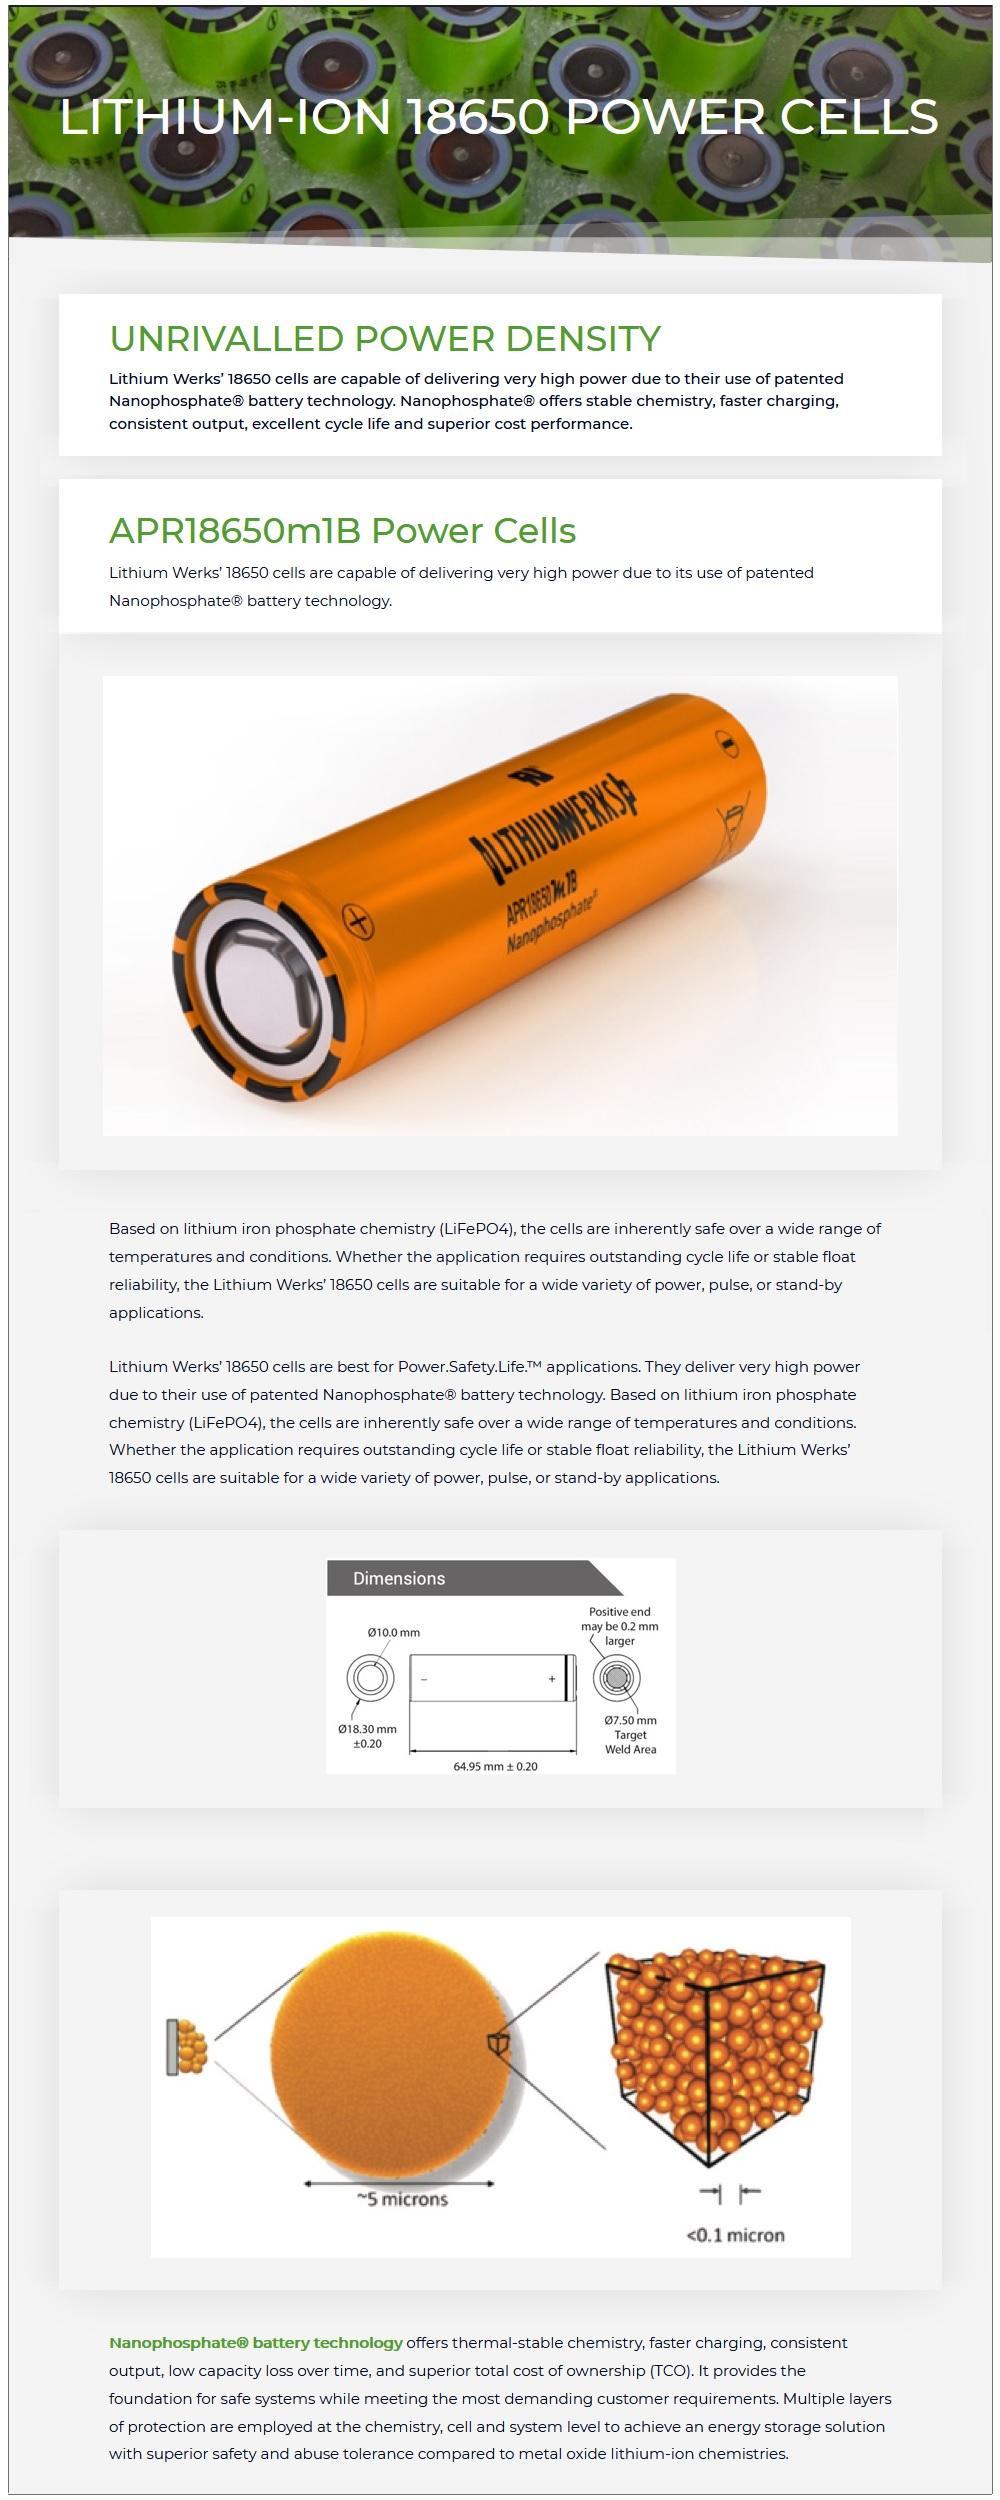 lithiumwerks-apr18650m1b-power-cell-story.jpg